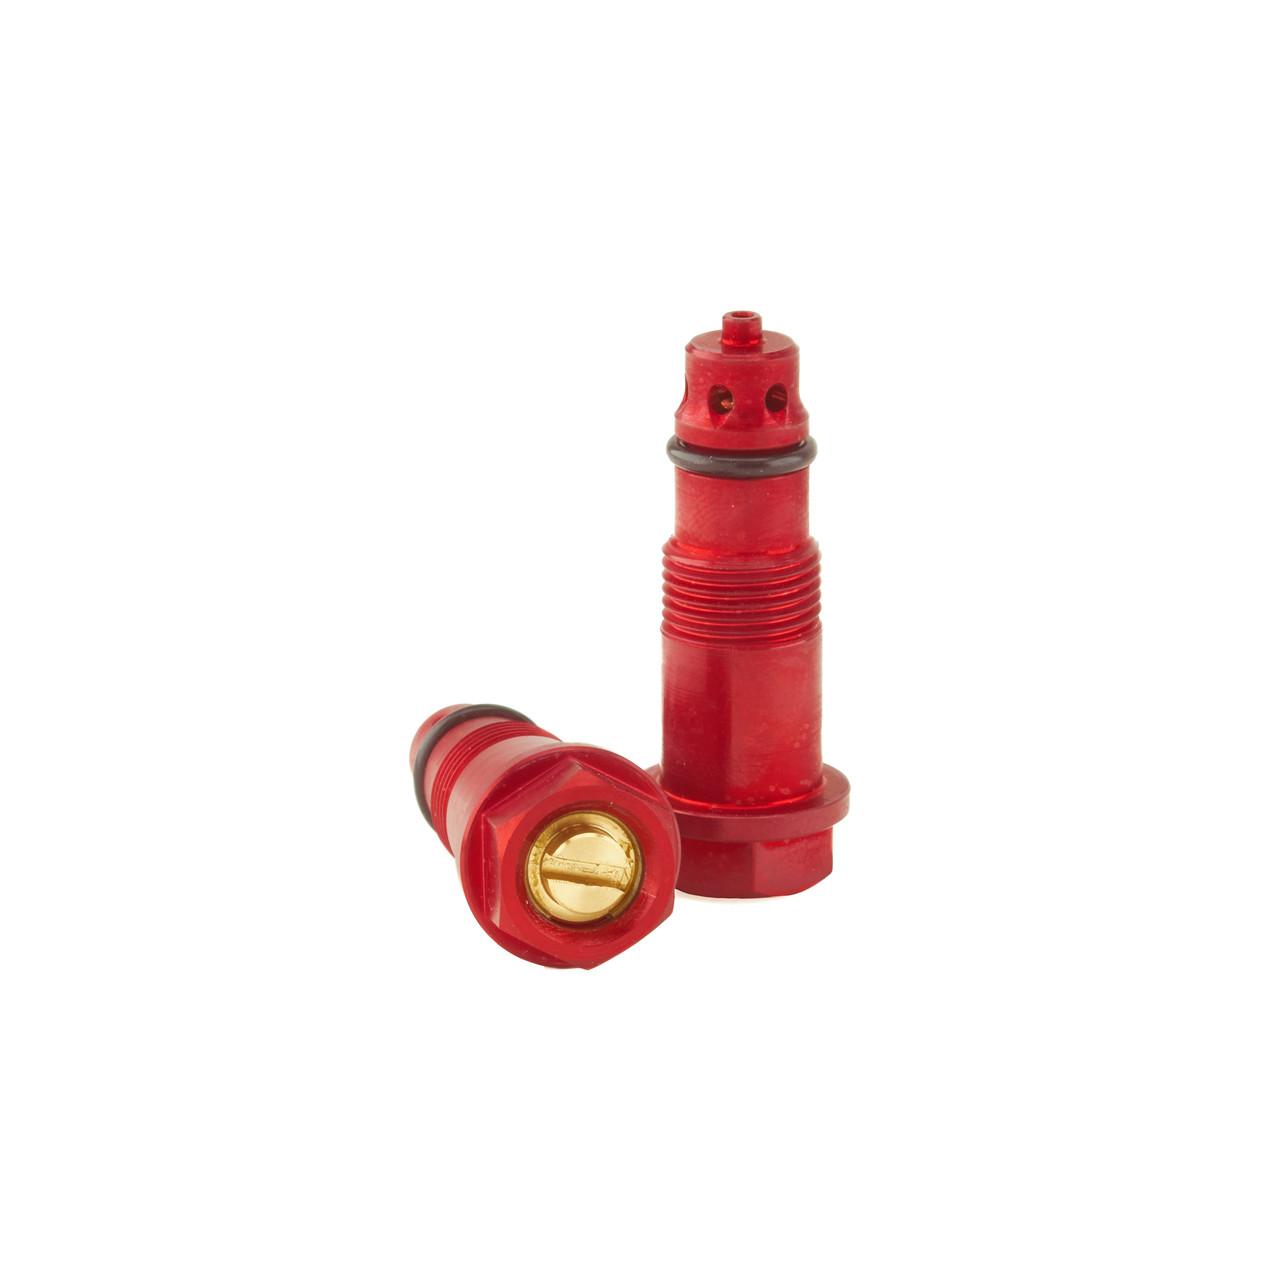 FF FCV KYB 1.5mm KAWA ZX-R 98-03  YAMAHA R1 98-03, R6 98-04 20K-FCV-KYB1